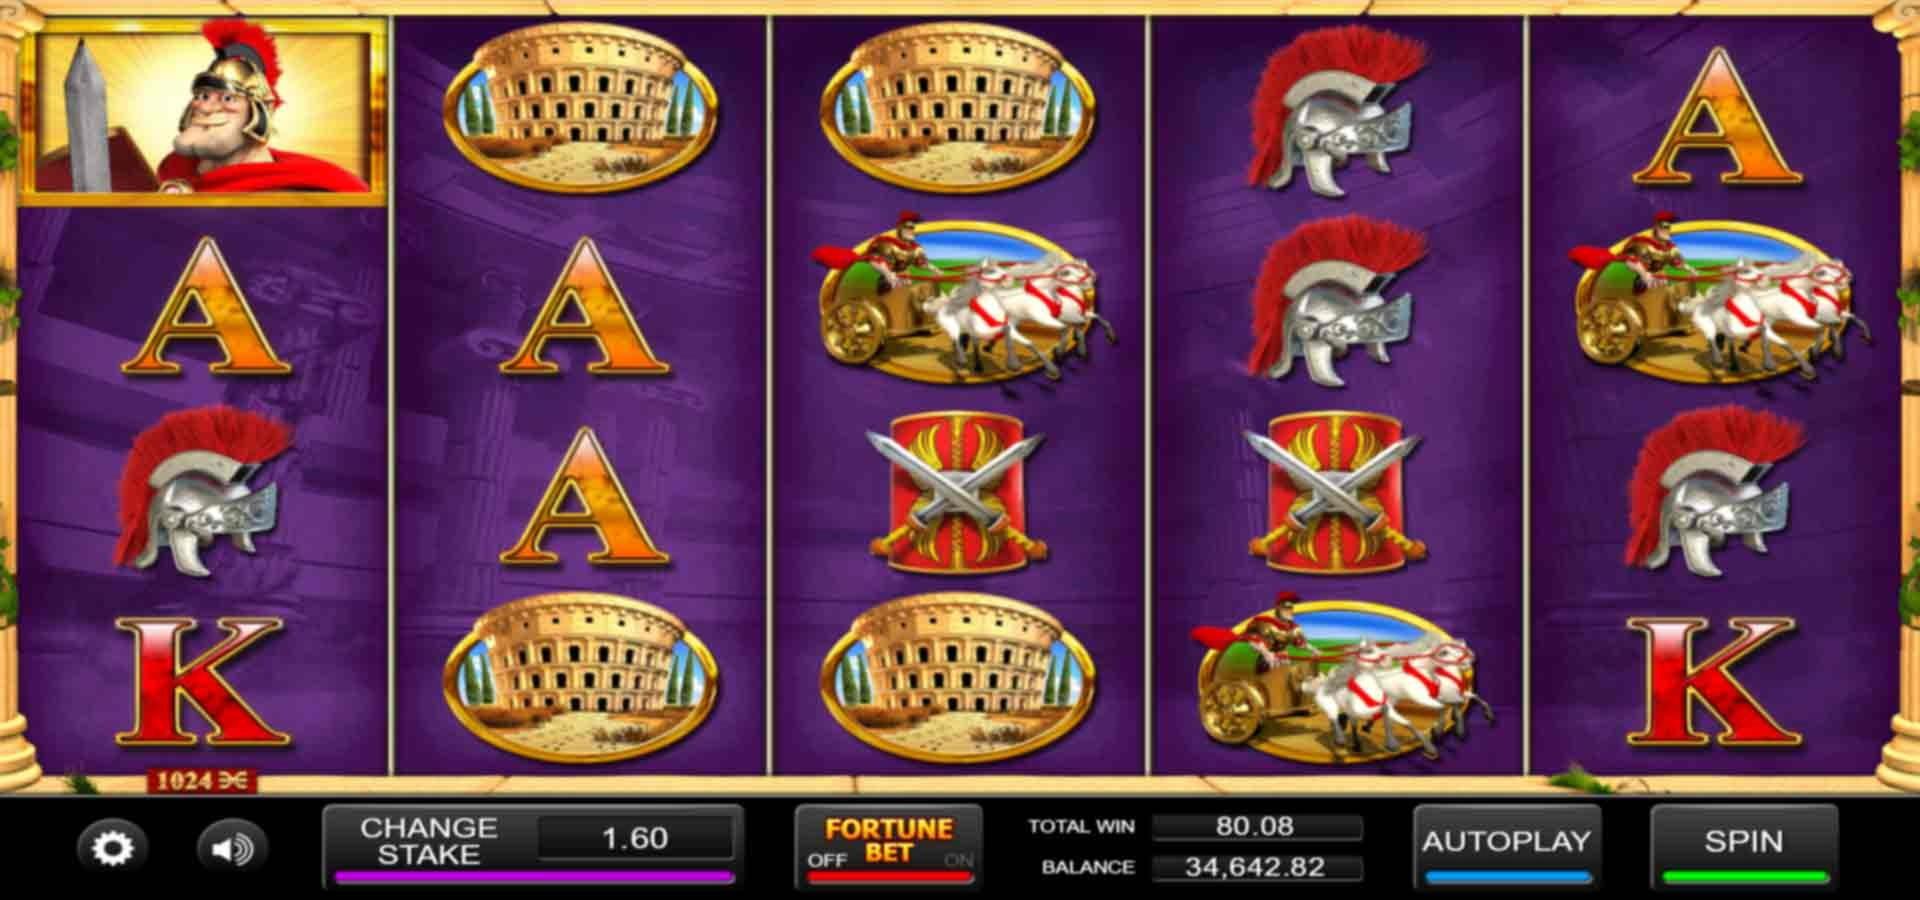 Jaak Casino-da 1940 NO depozitlari CASINO BONUS